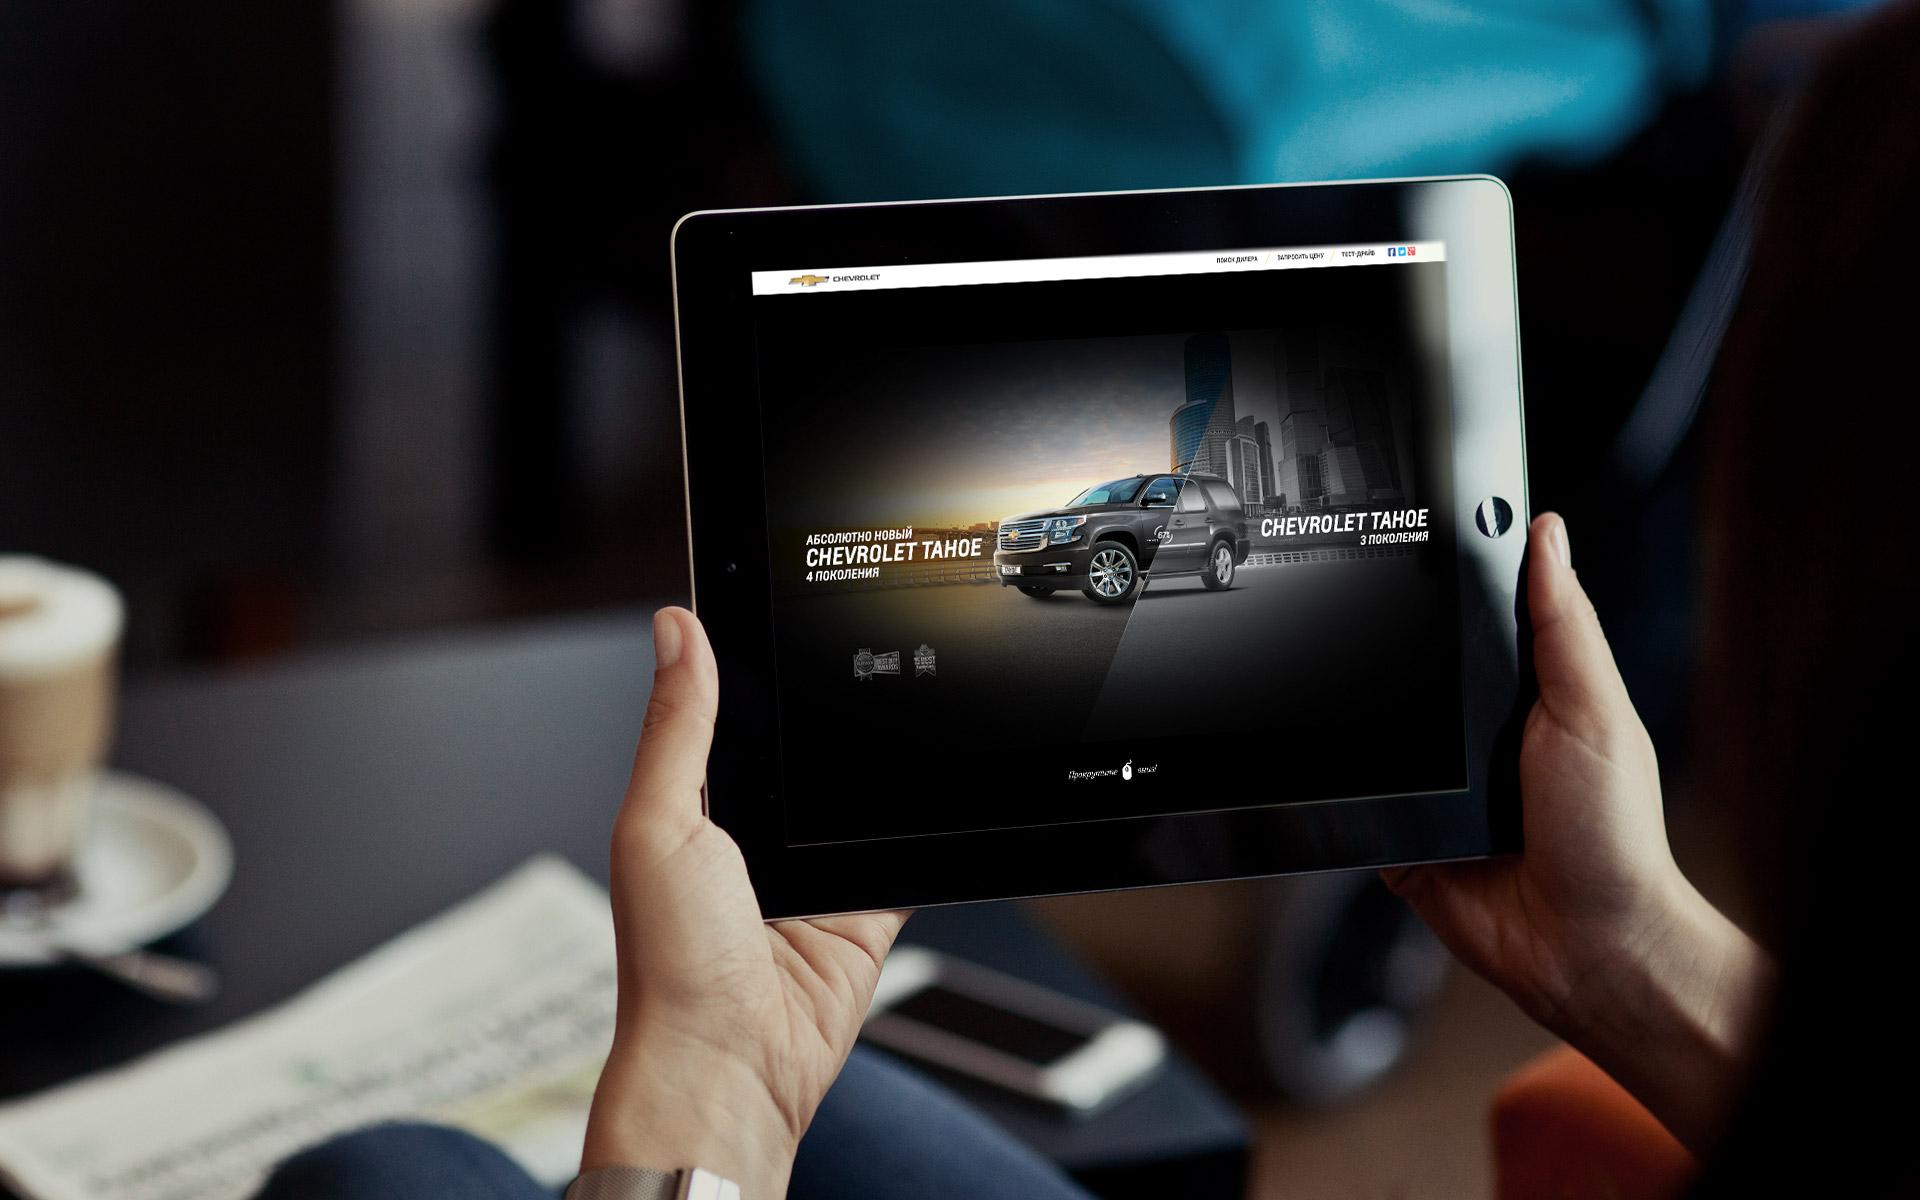 Chevrolet Tahoe 2015 promo site.